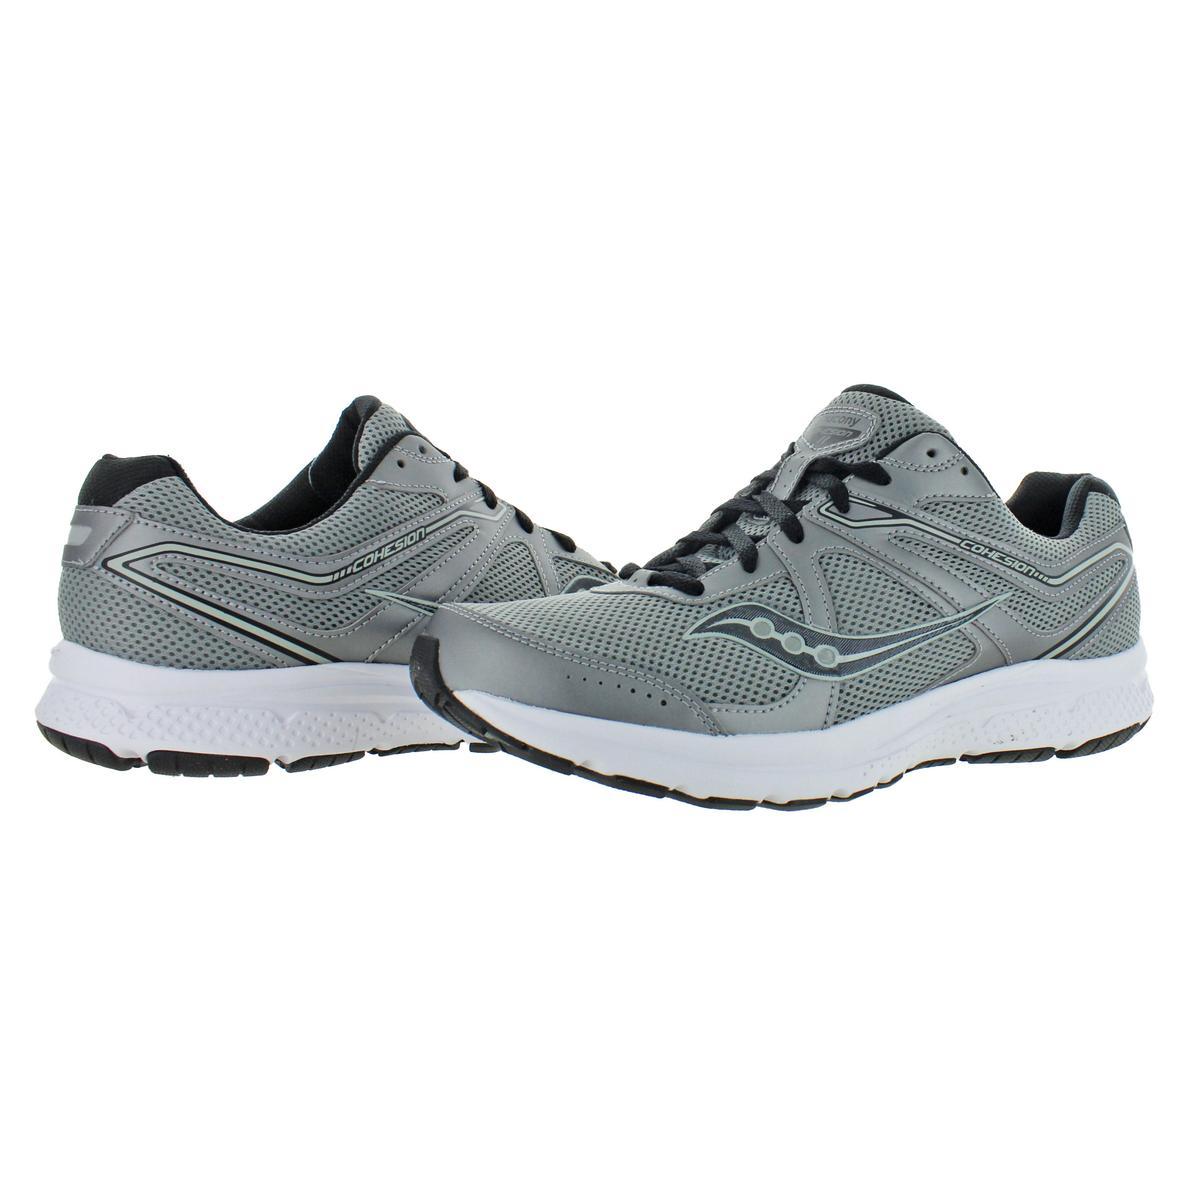 Saucony-Herren-Grid-Kohaesions-11-Ubung-Fitness-Laufschuhe-Sneakers-bhfo-2076 Indexbild 5